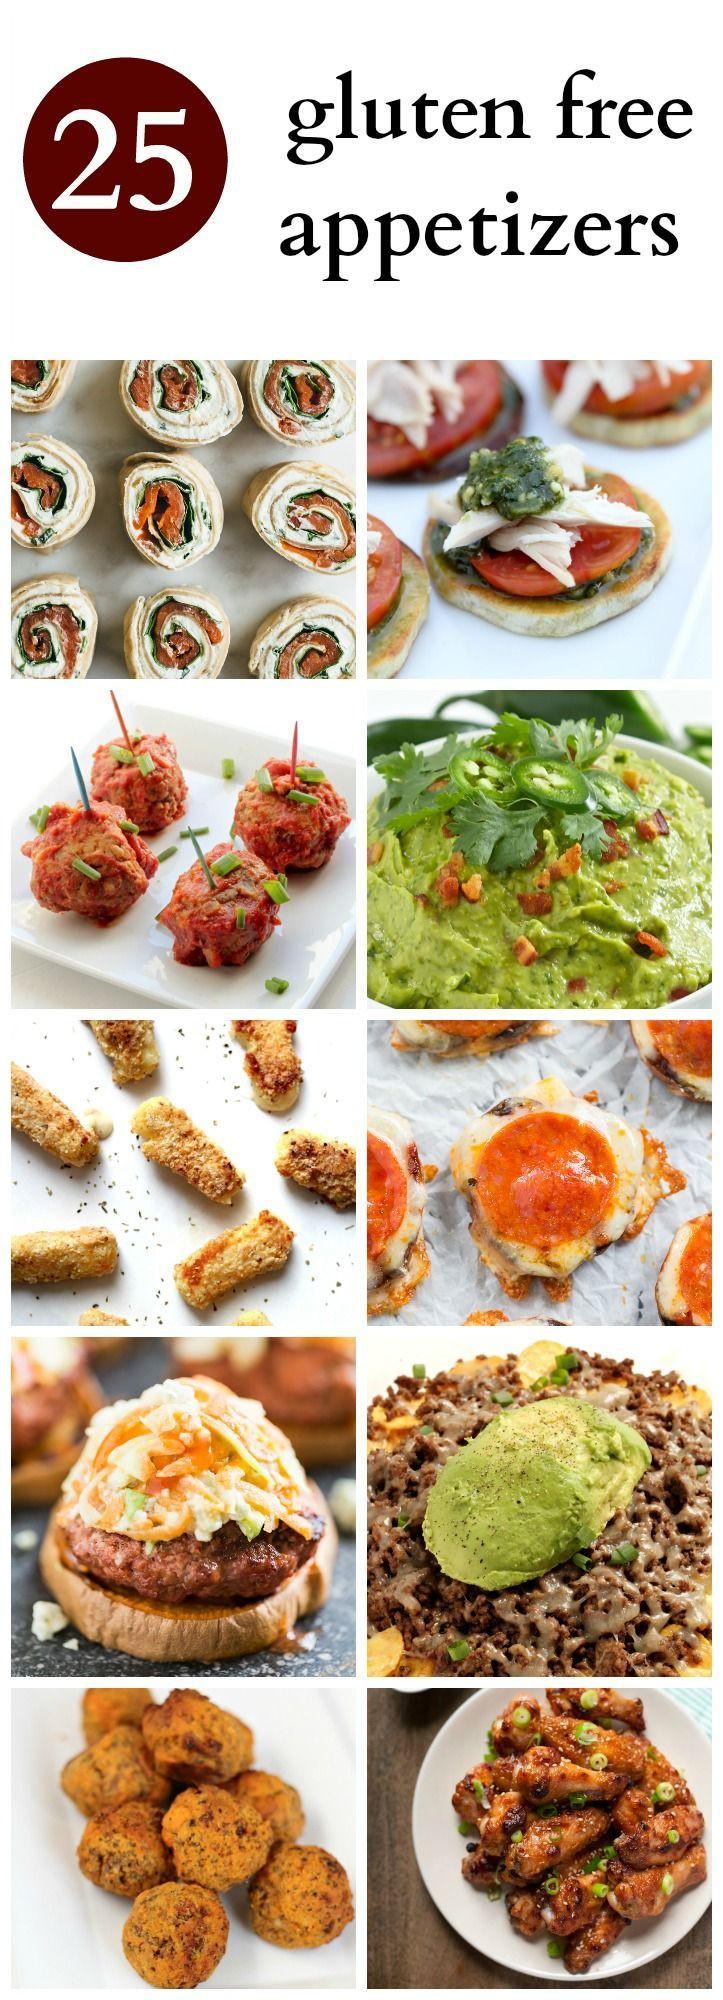 Gluten Free Appetizer Recipes  17 Best ideas about Gluten Free Party Food on Pinterest